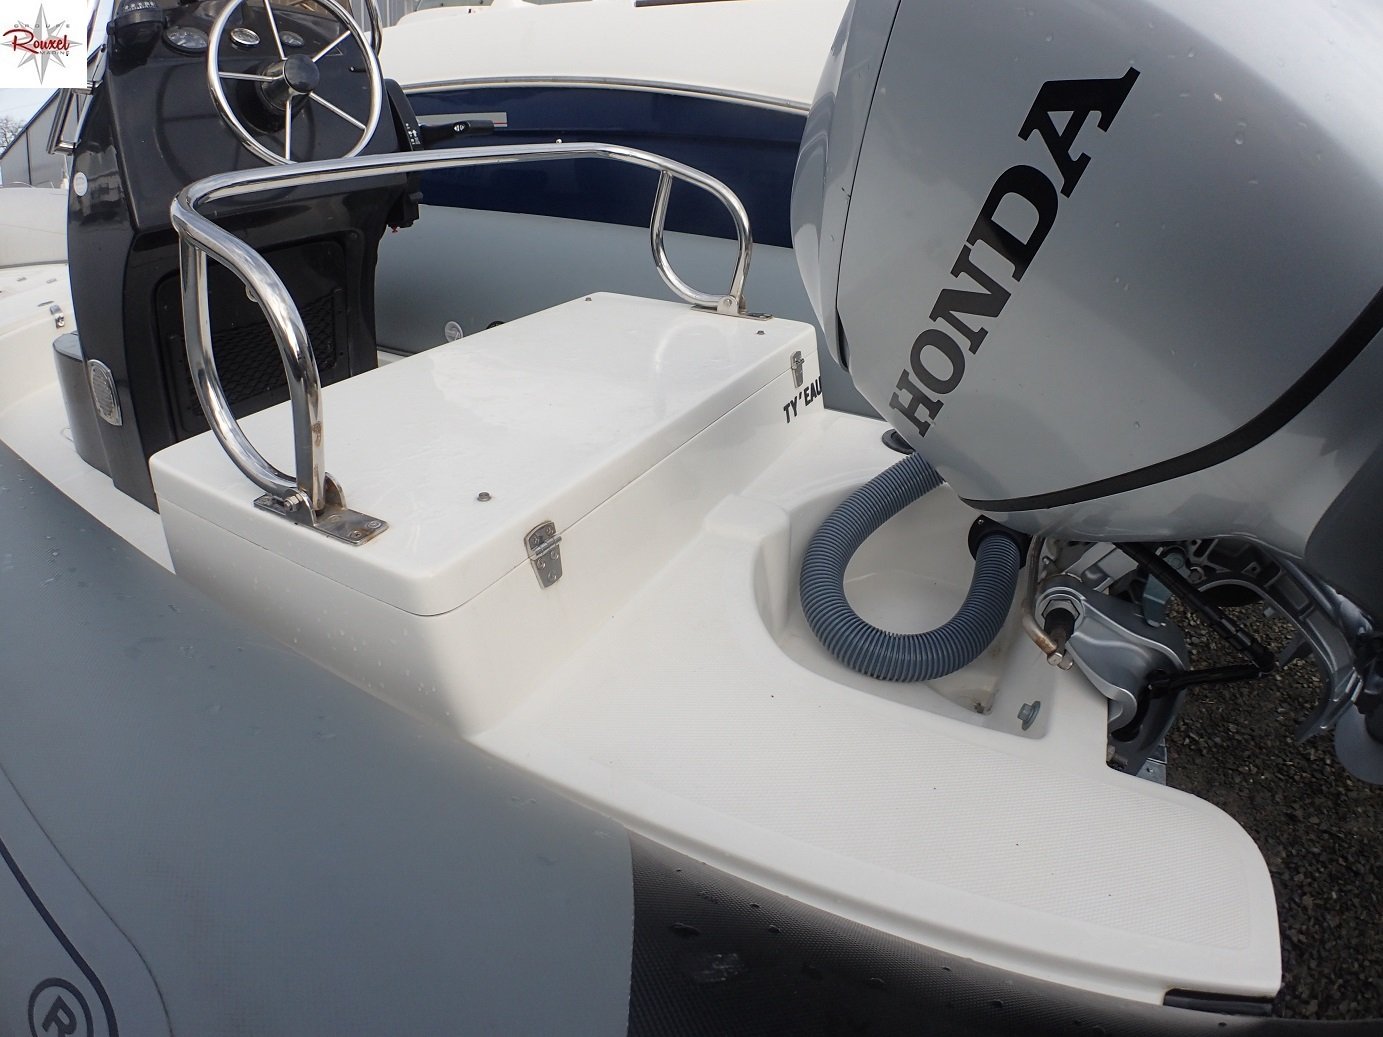 3D TENDER LUX 550 - Ty'eau - 2017